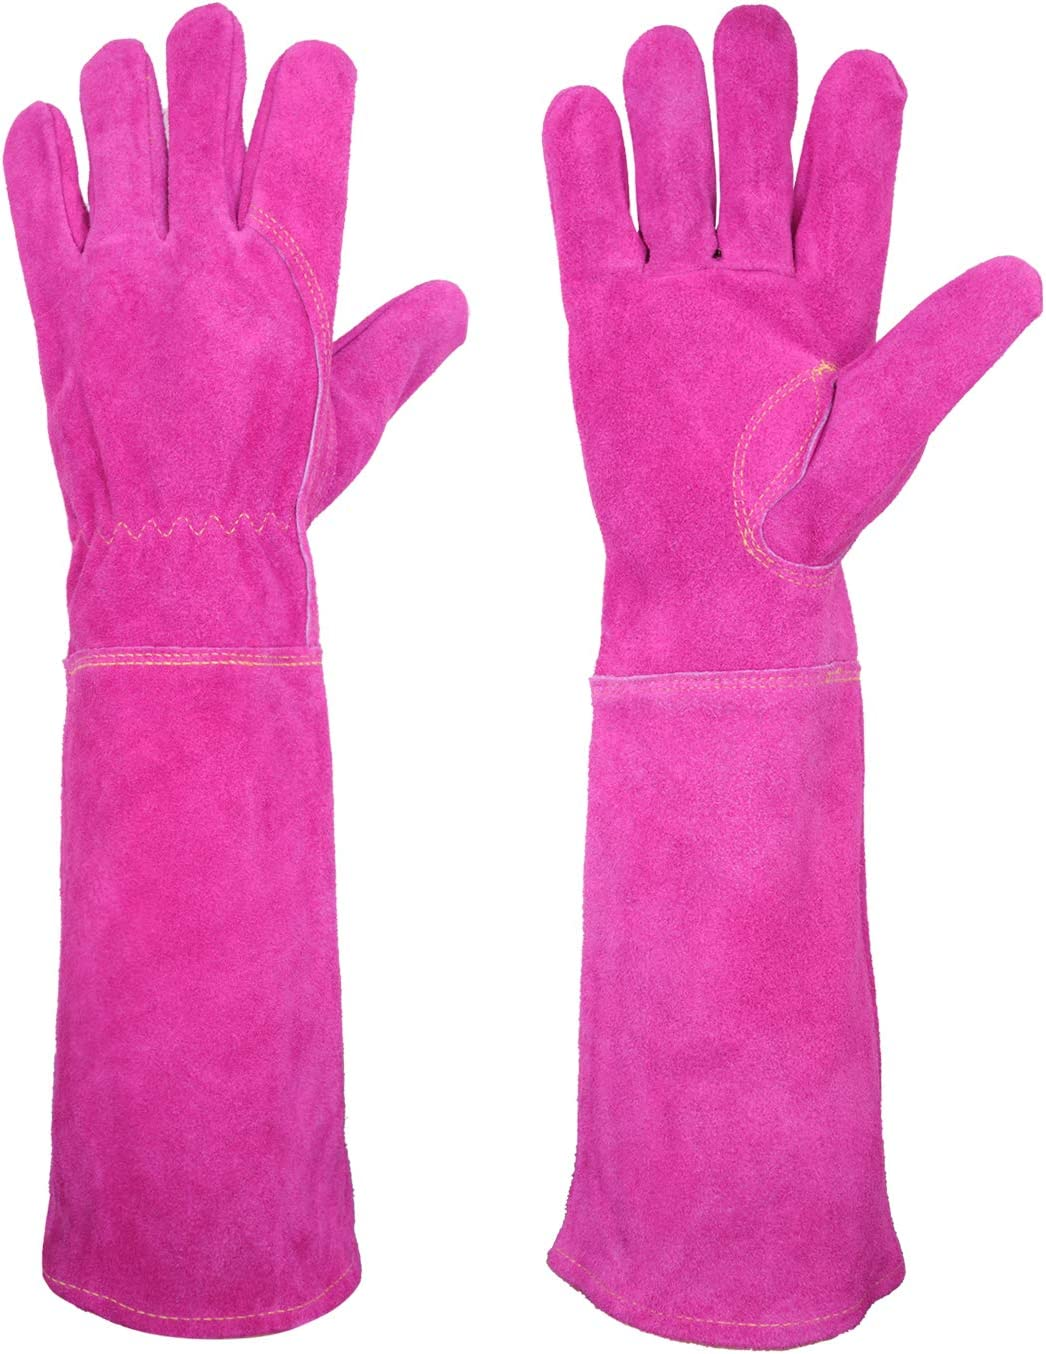 Rose Pruning Gloves for Women Long Sleeve Thorn Proof Cowhide Leather Gardening Gloves Gauntlet Garden Gloves (Medium, Rose)